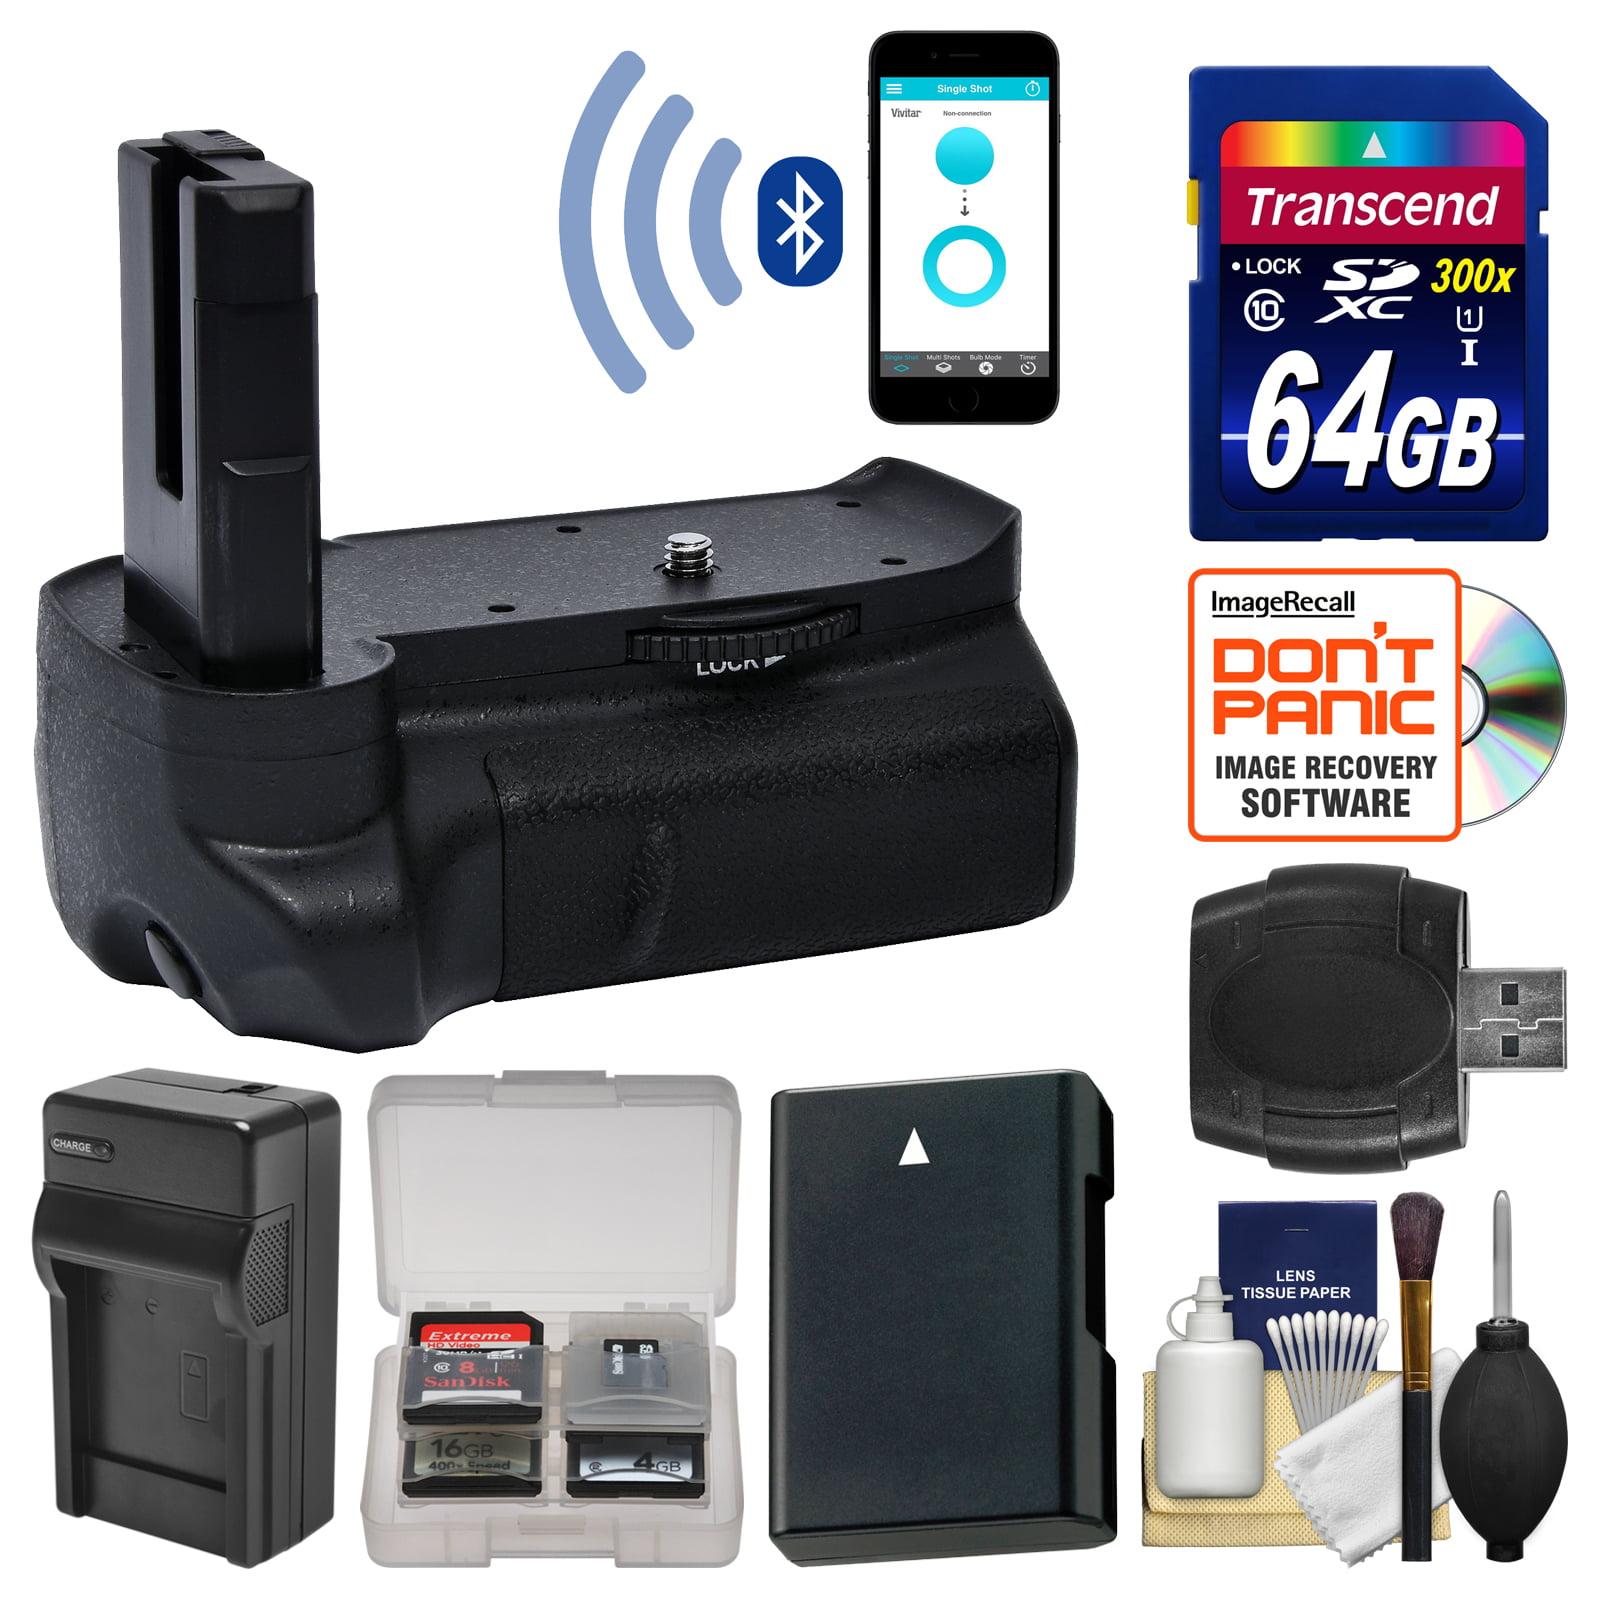 Vivitar Smart Bluetooth Smartphone Control Battery Grip for Nikon D3100, D3200 & D3300 DSLR Cameras with 64GB... by Vivitar